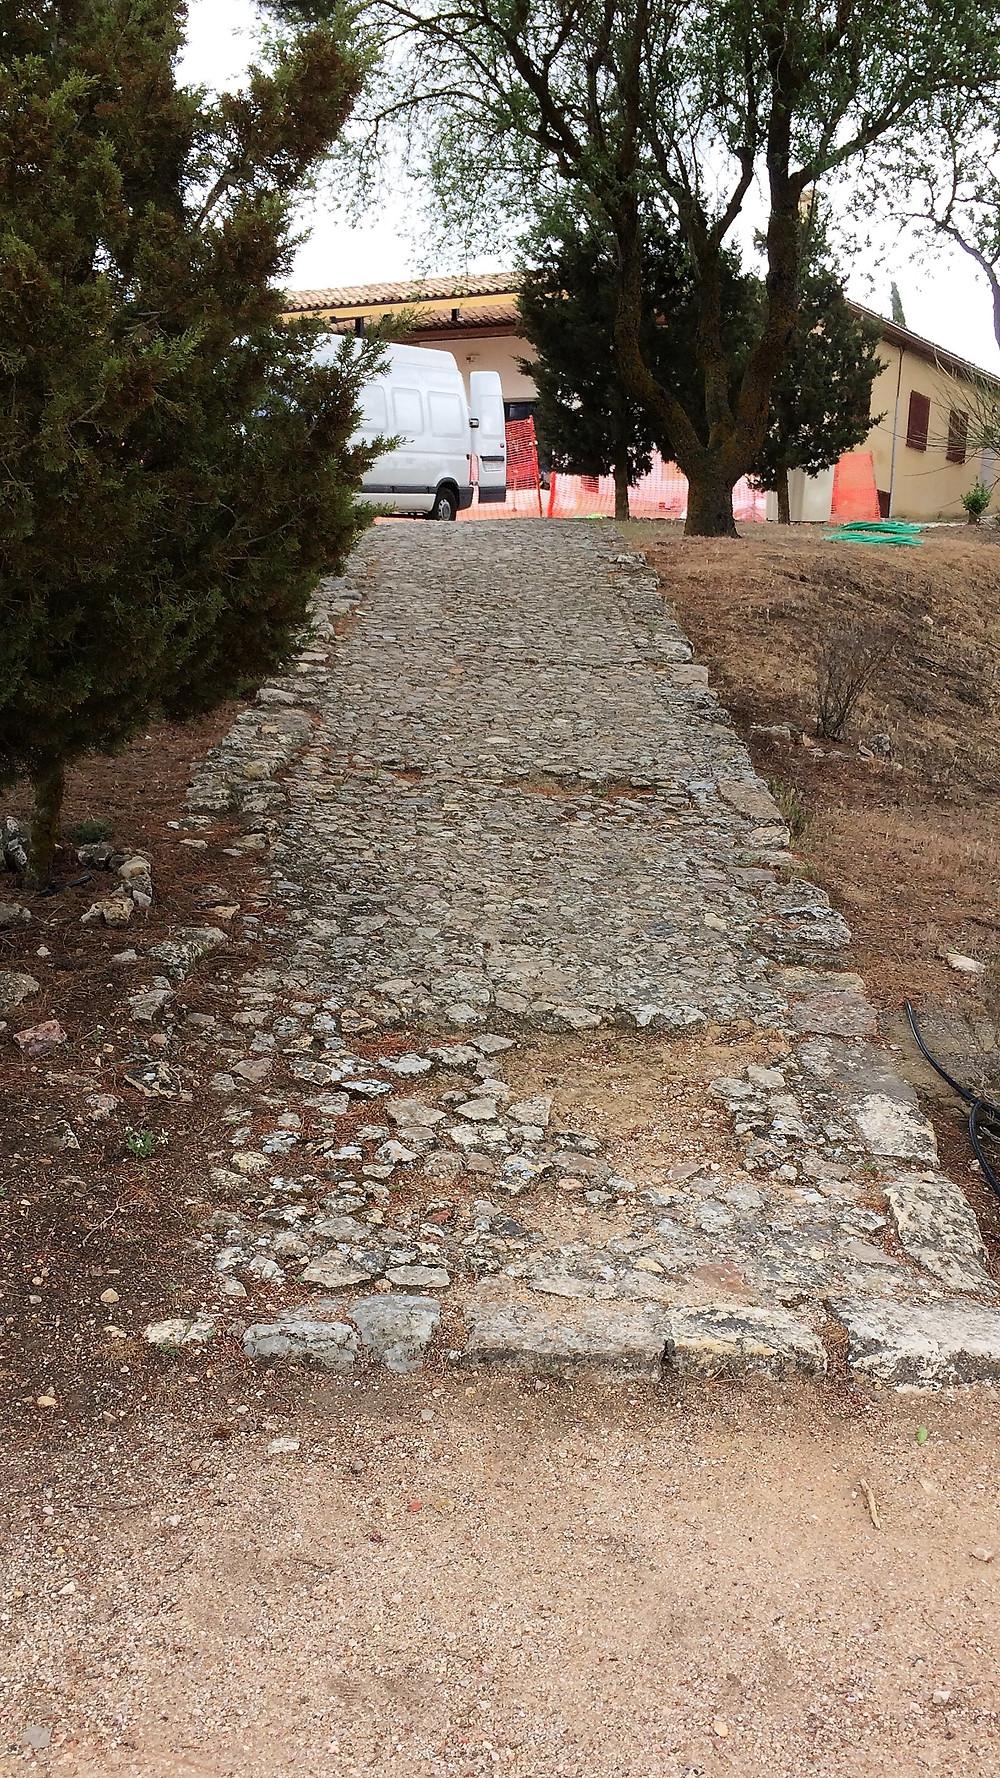 Segóbriga (Cuenca). España. Calzada romana